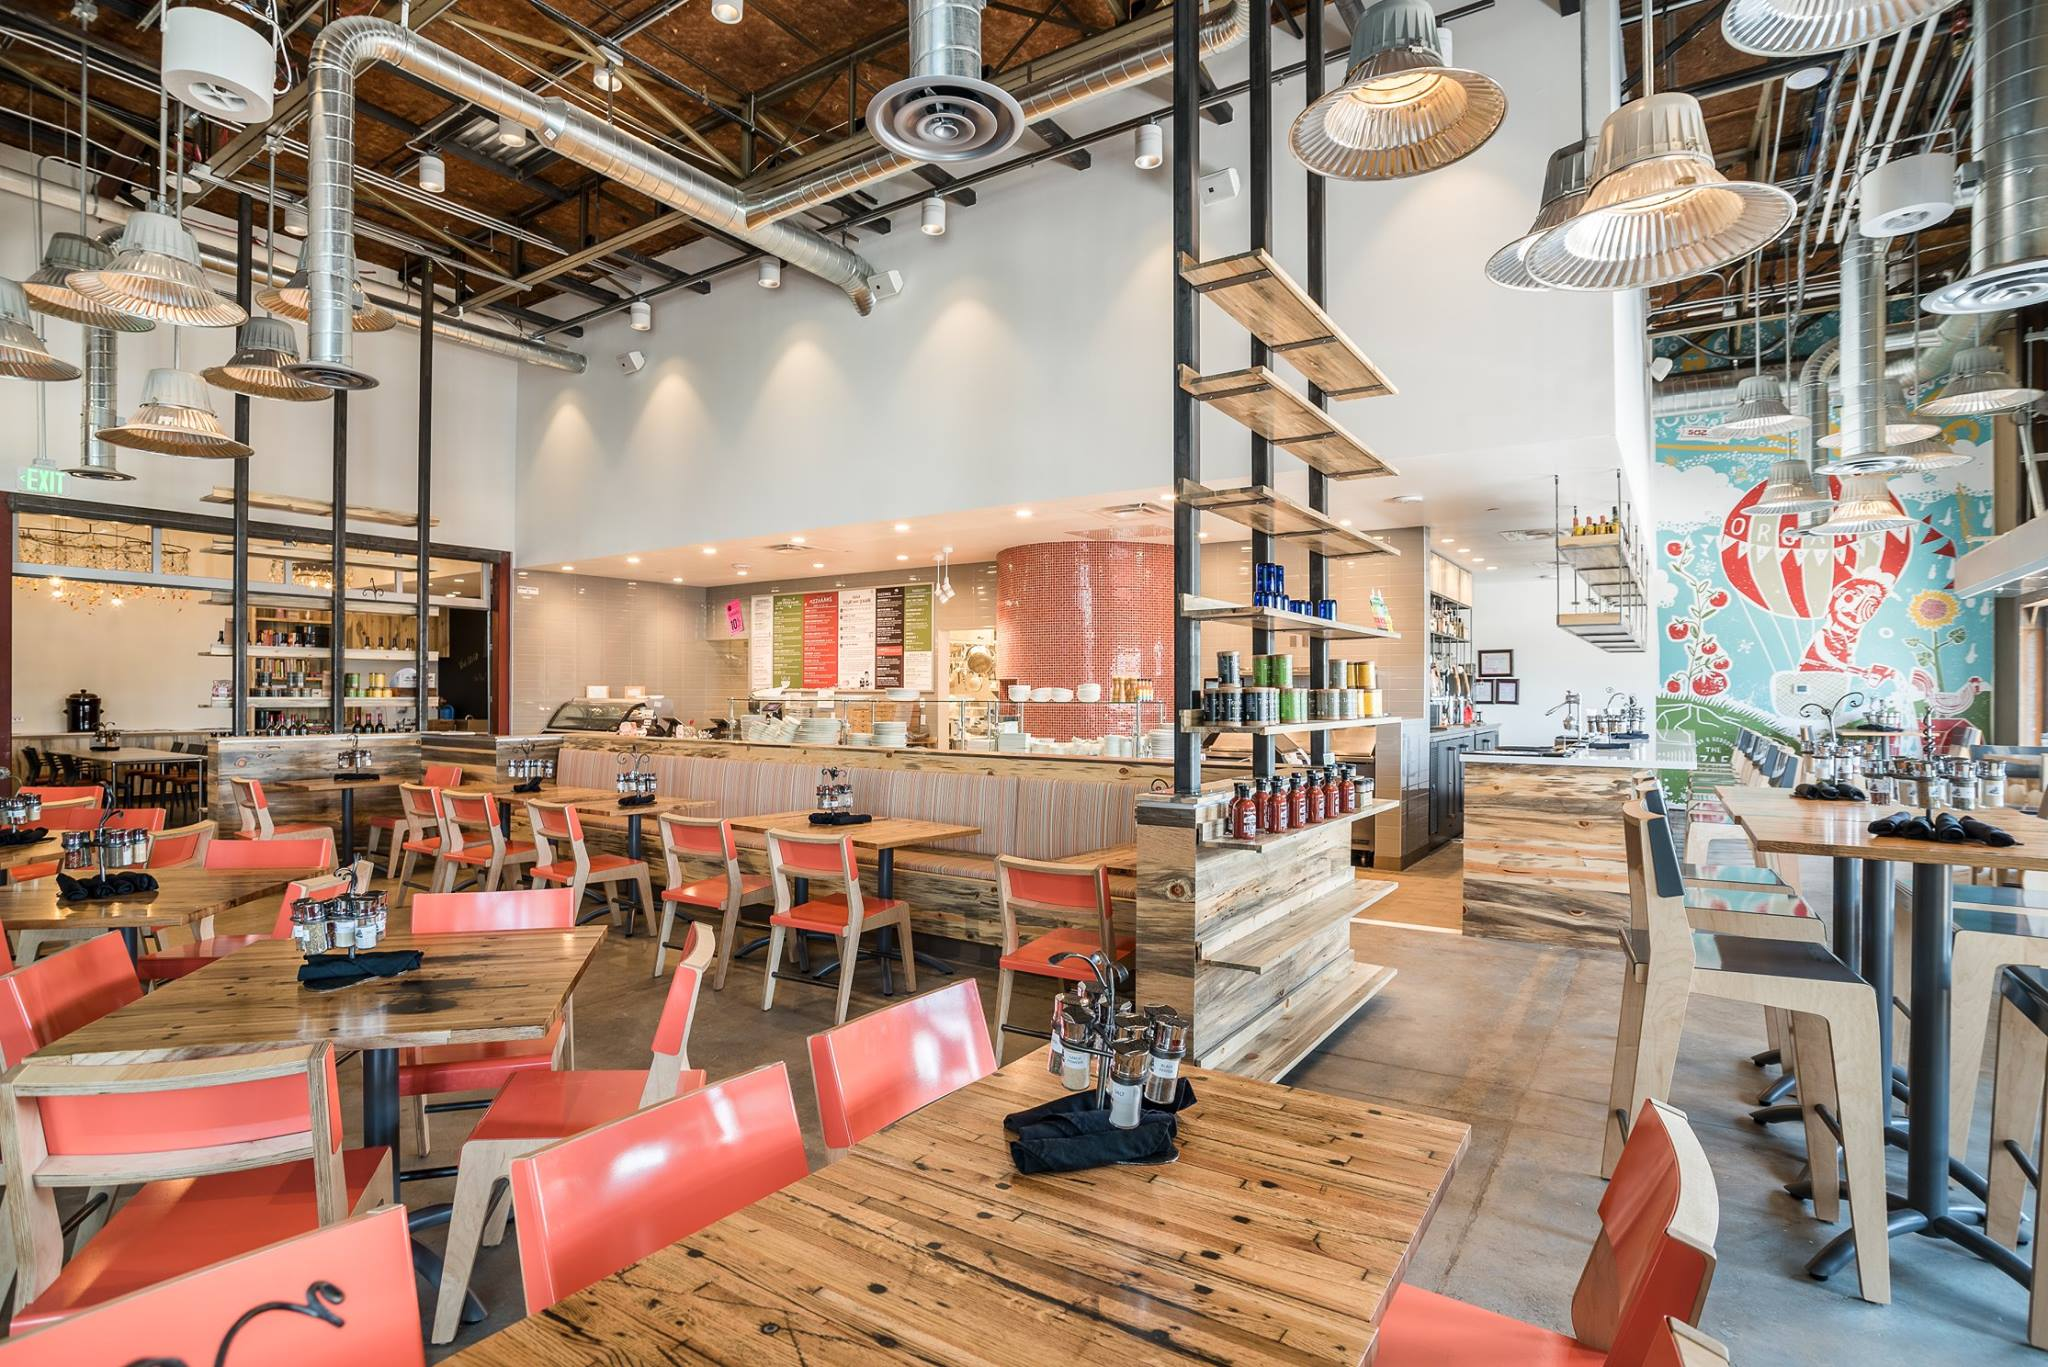 sazza restaurant space